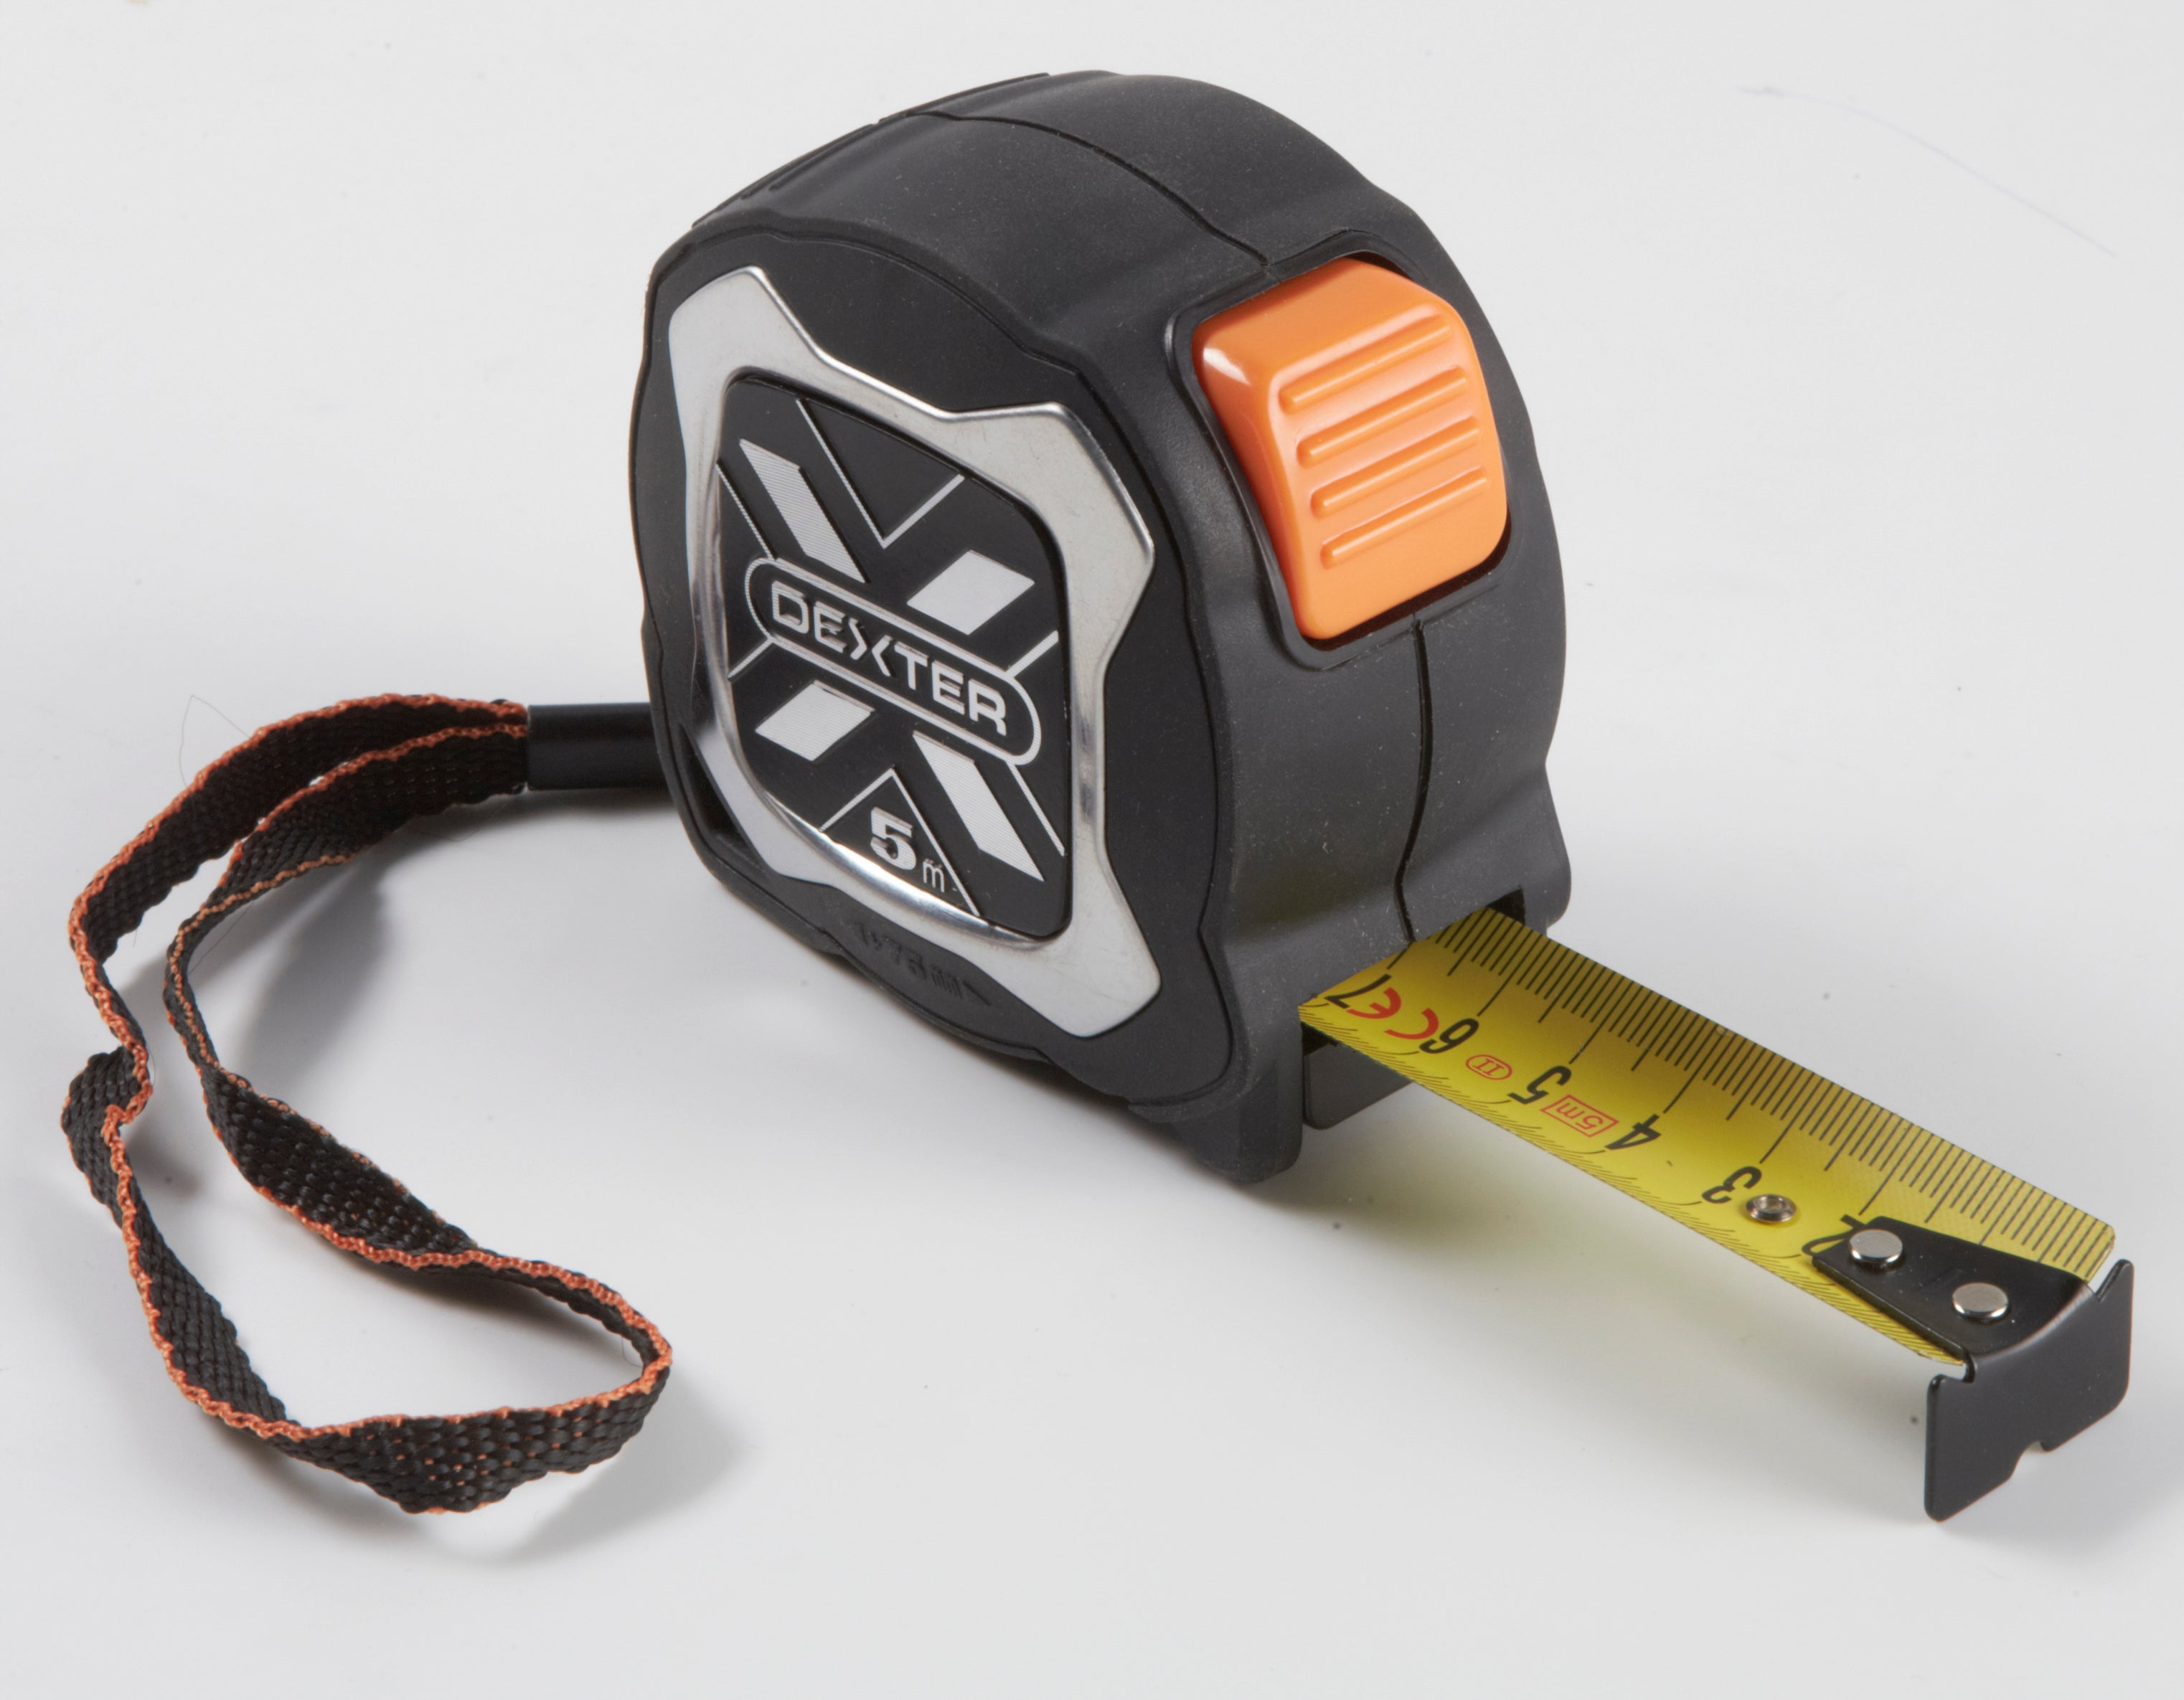 Ruban de mesure en acier 50m mètre à ruban avec manivelle mesurer mètre ruban